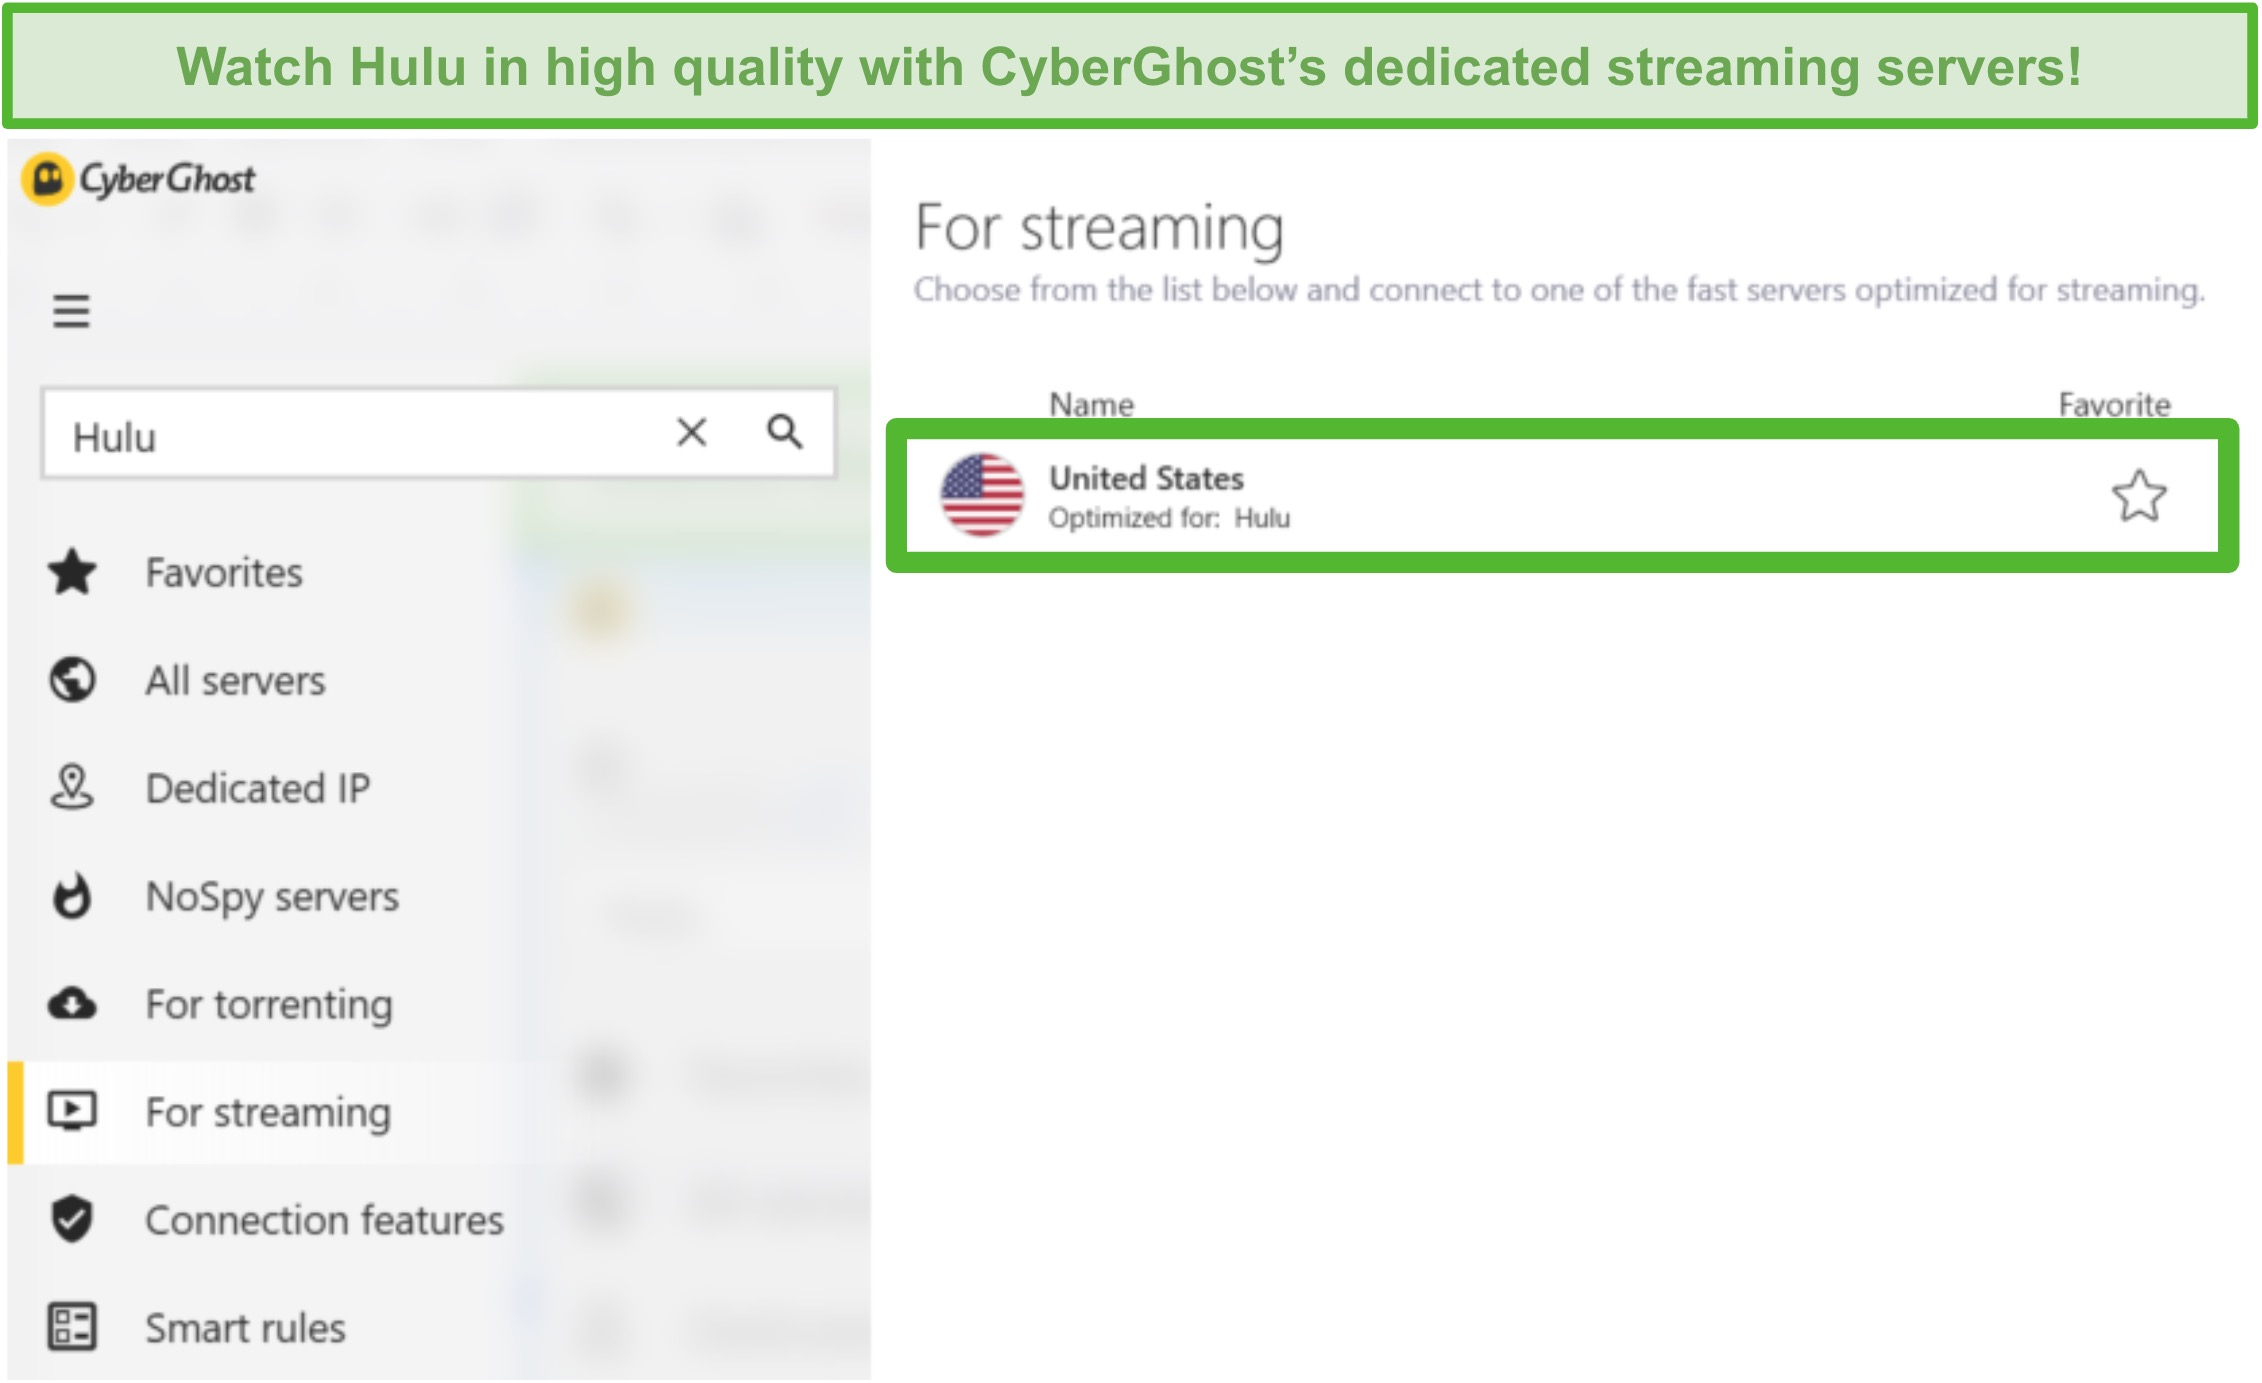 Screenshot of CyberGhost's dedicated Hulu streaming server.